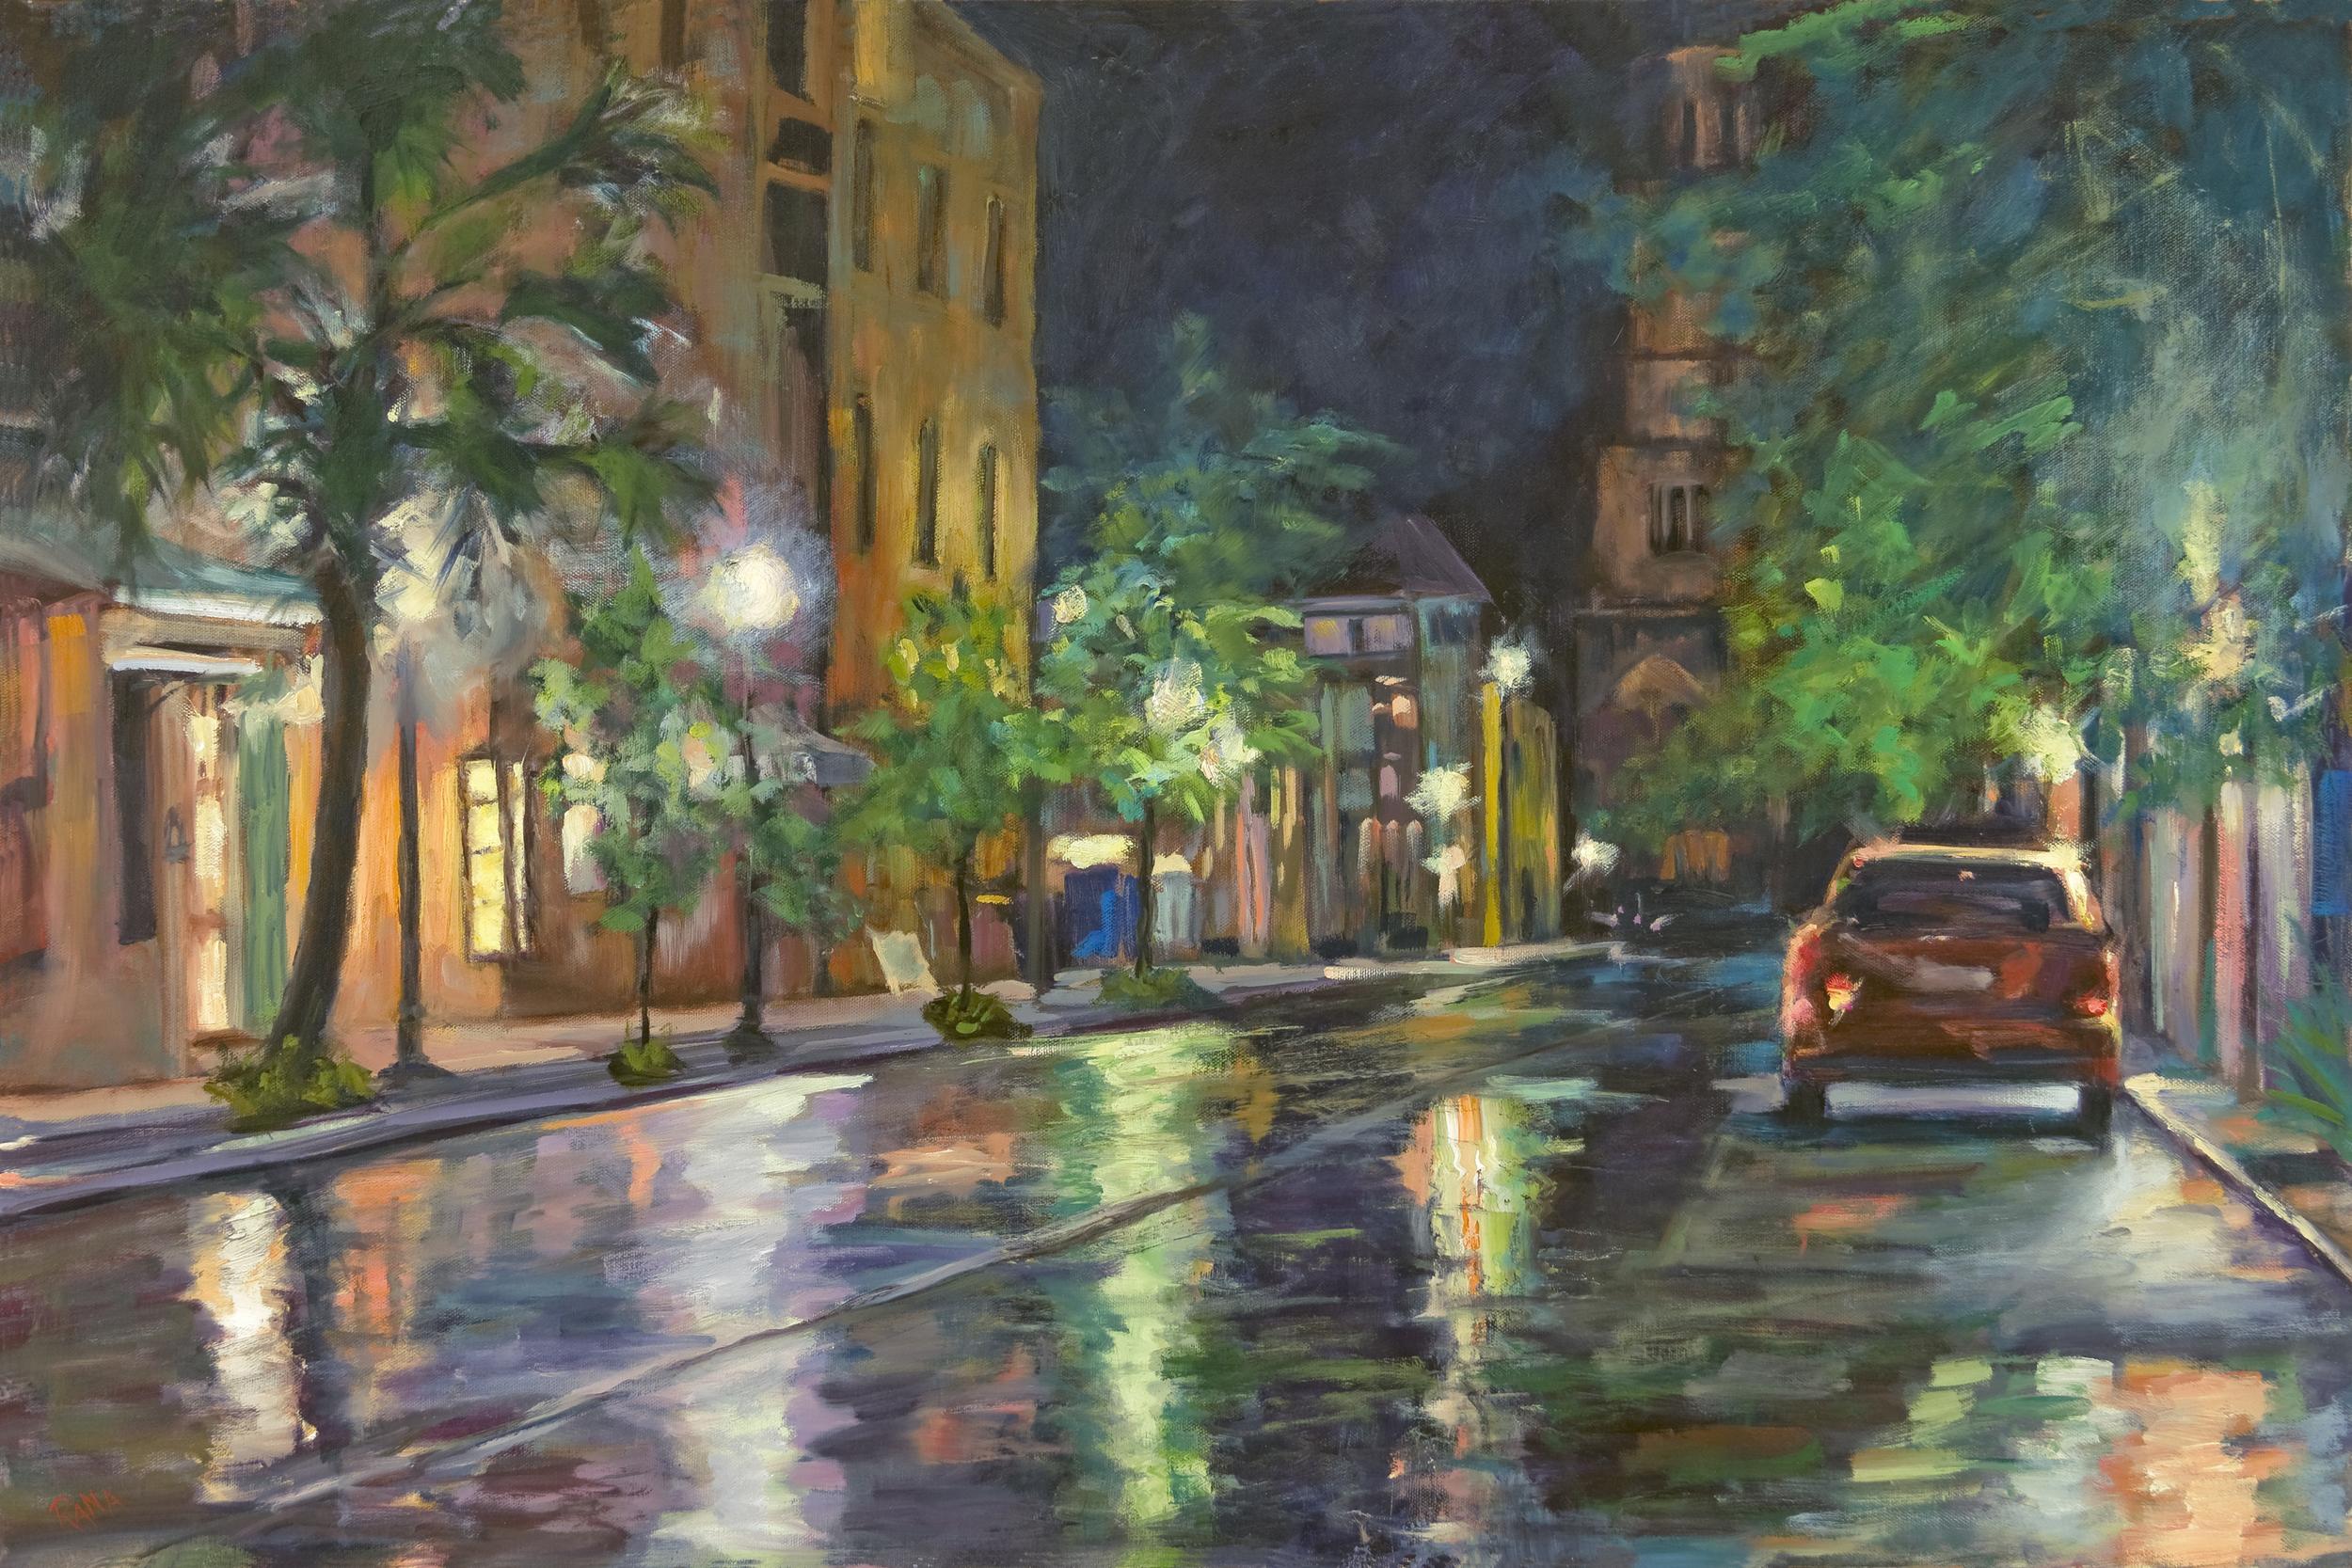 Church Street Nocturne - Orig 24x36.jpg